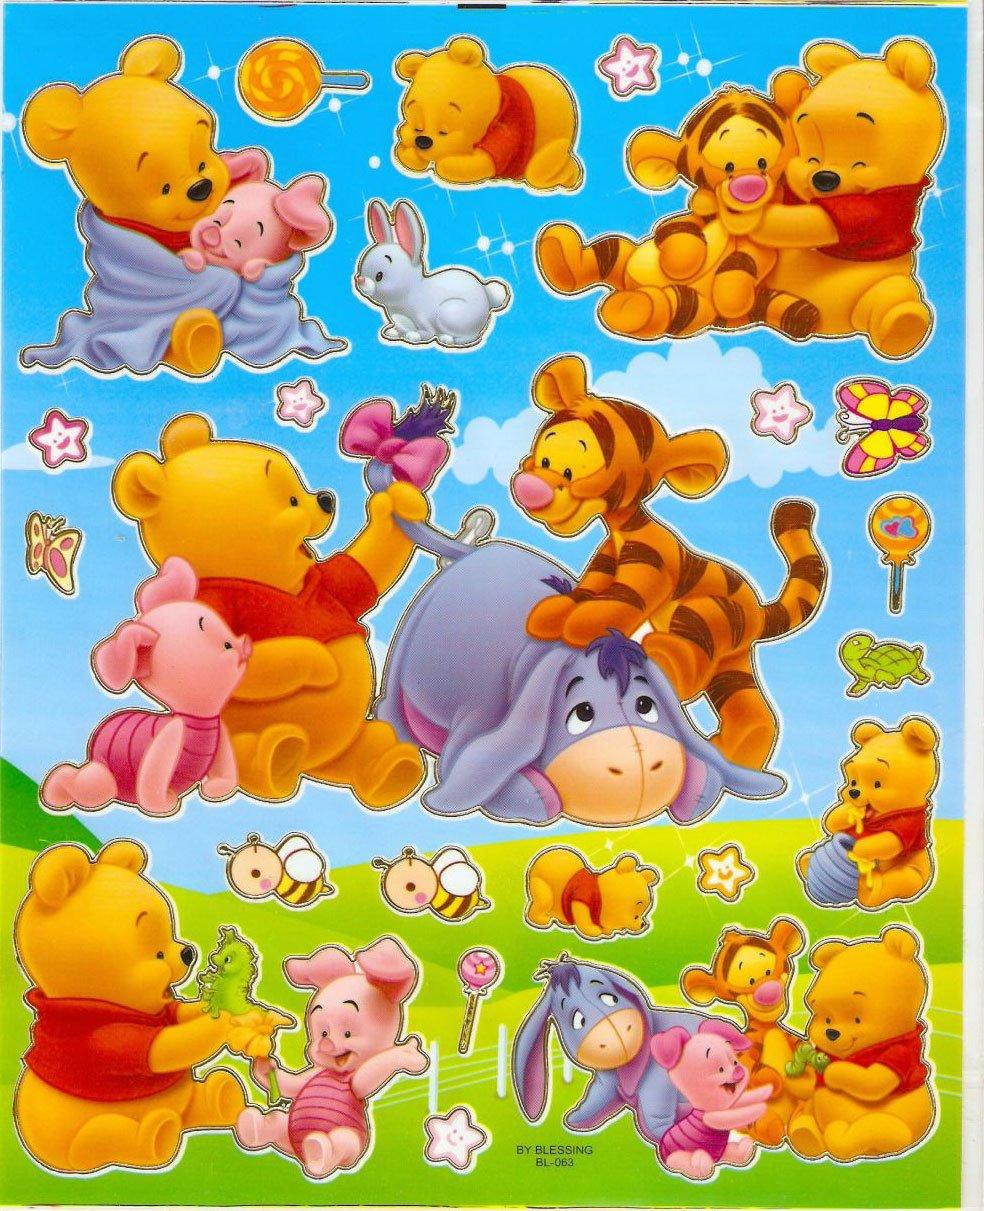 10 Big sheets Baby Pooh Sticker Buy 2 lots Bonus 1 #WP BL063/PM194